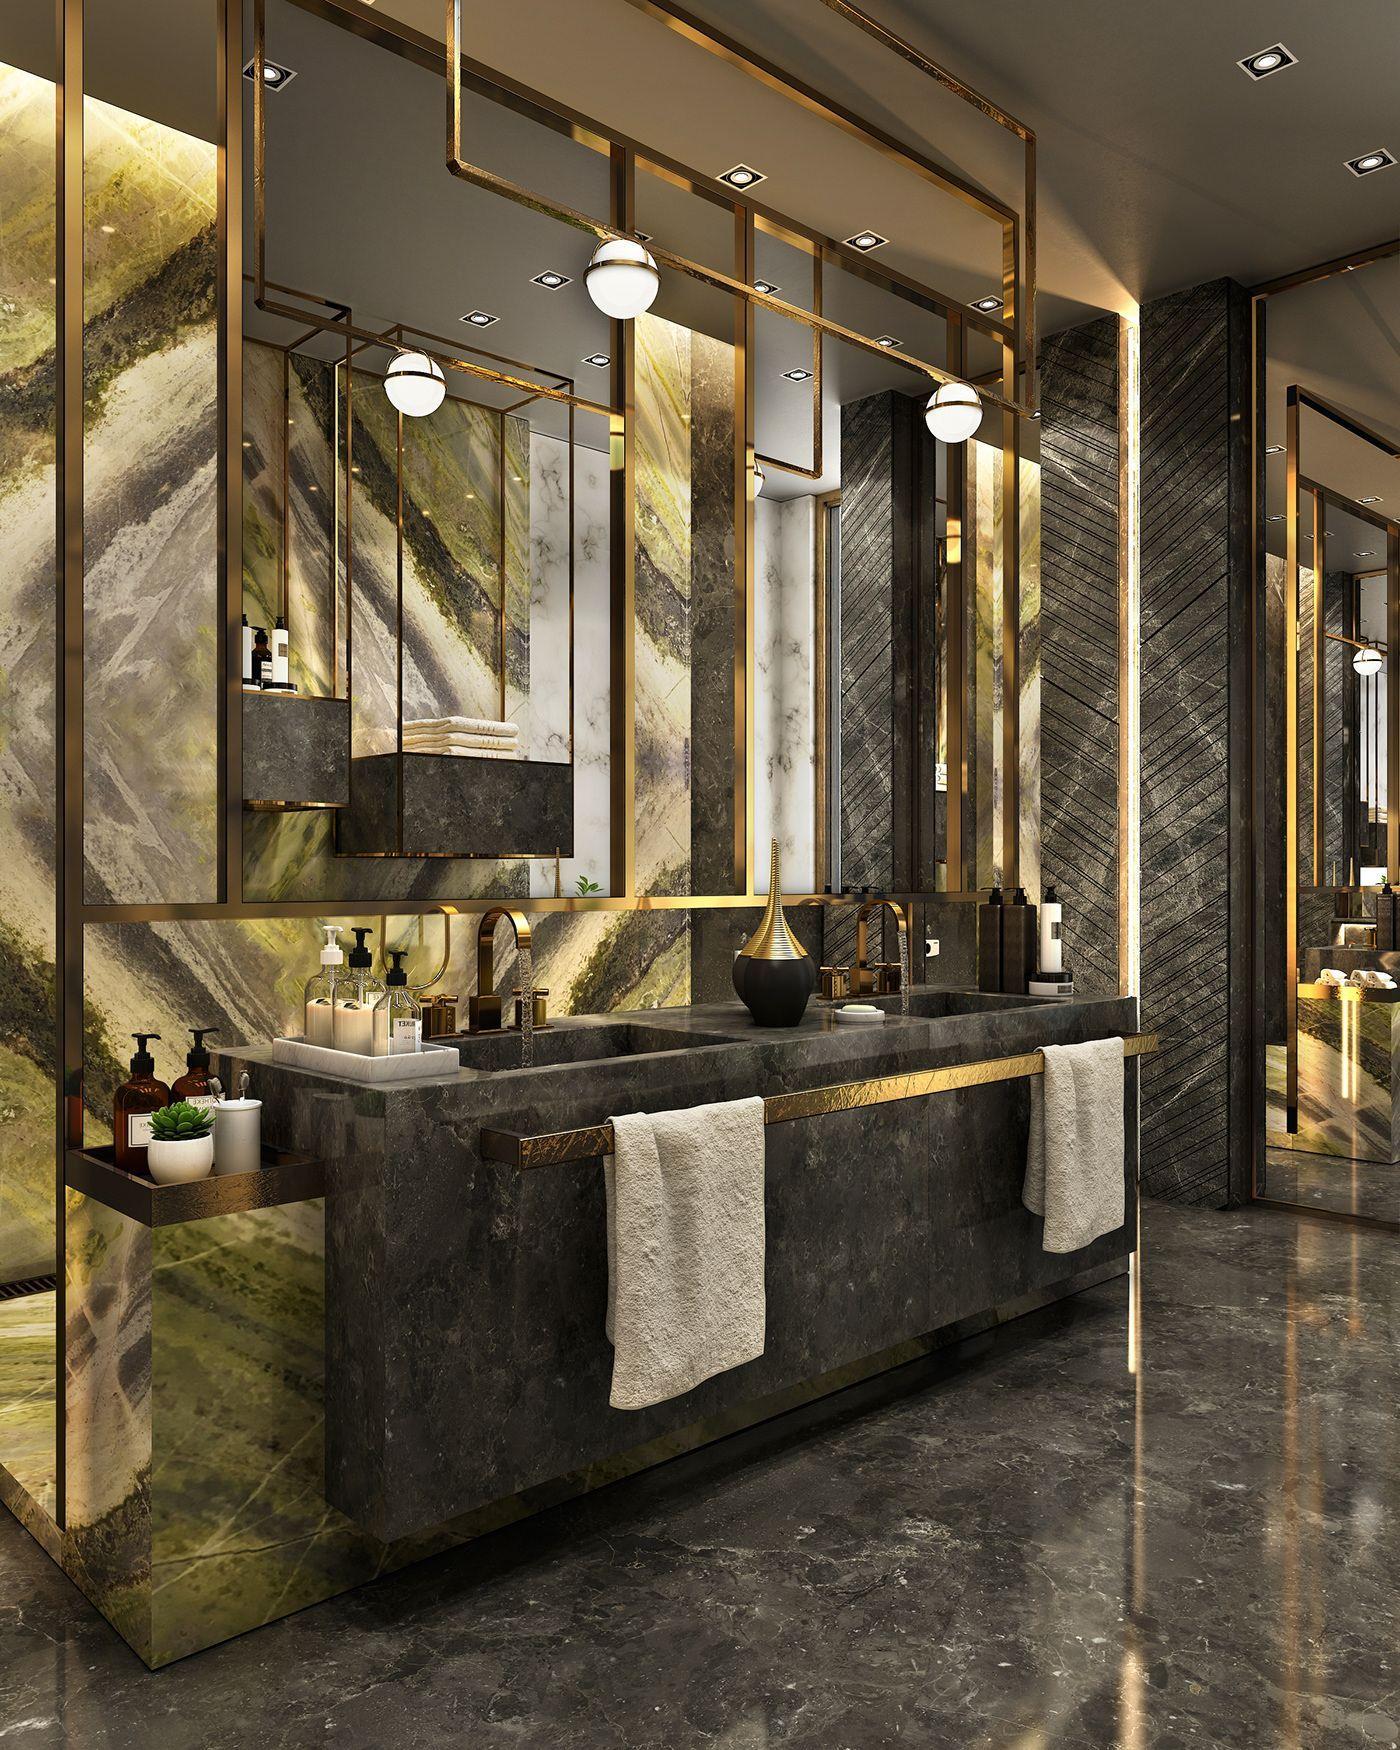 Antolini Black Bathroom Antolini Banheiromodernos Bathroom In 2020 Luxurioses Badezimmer Modernes Badezimmerdesign Badezimmer